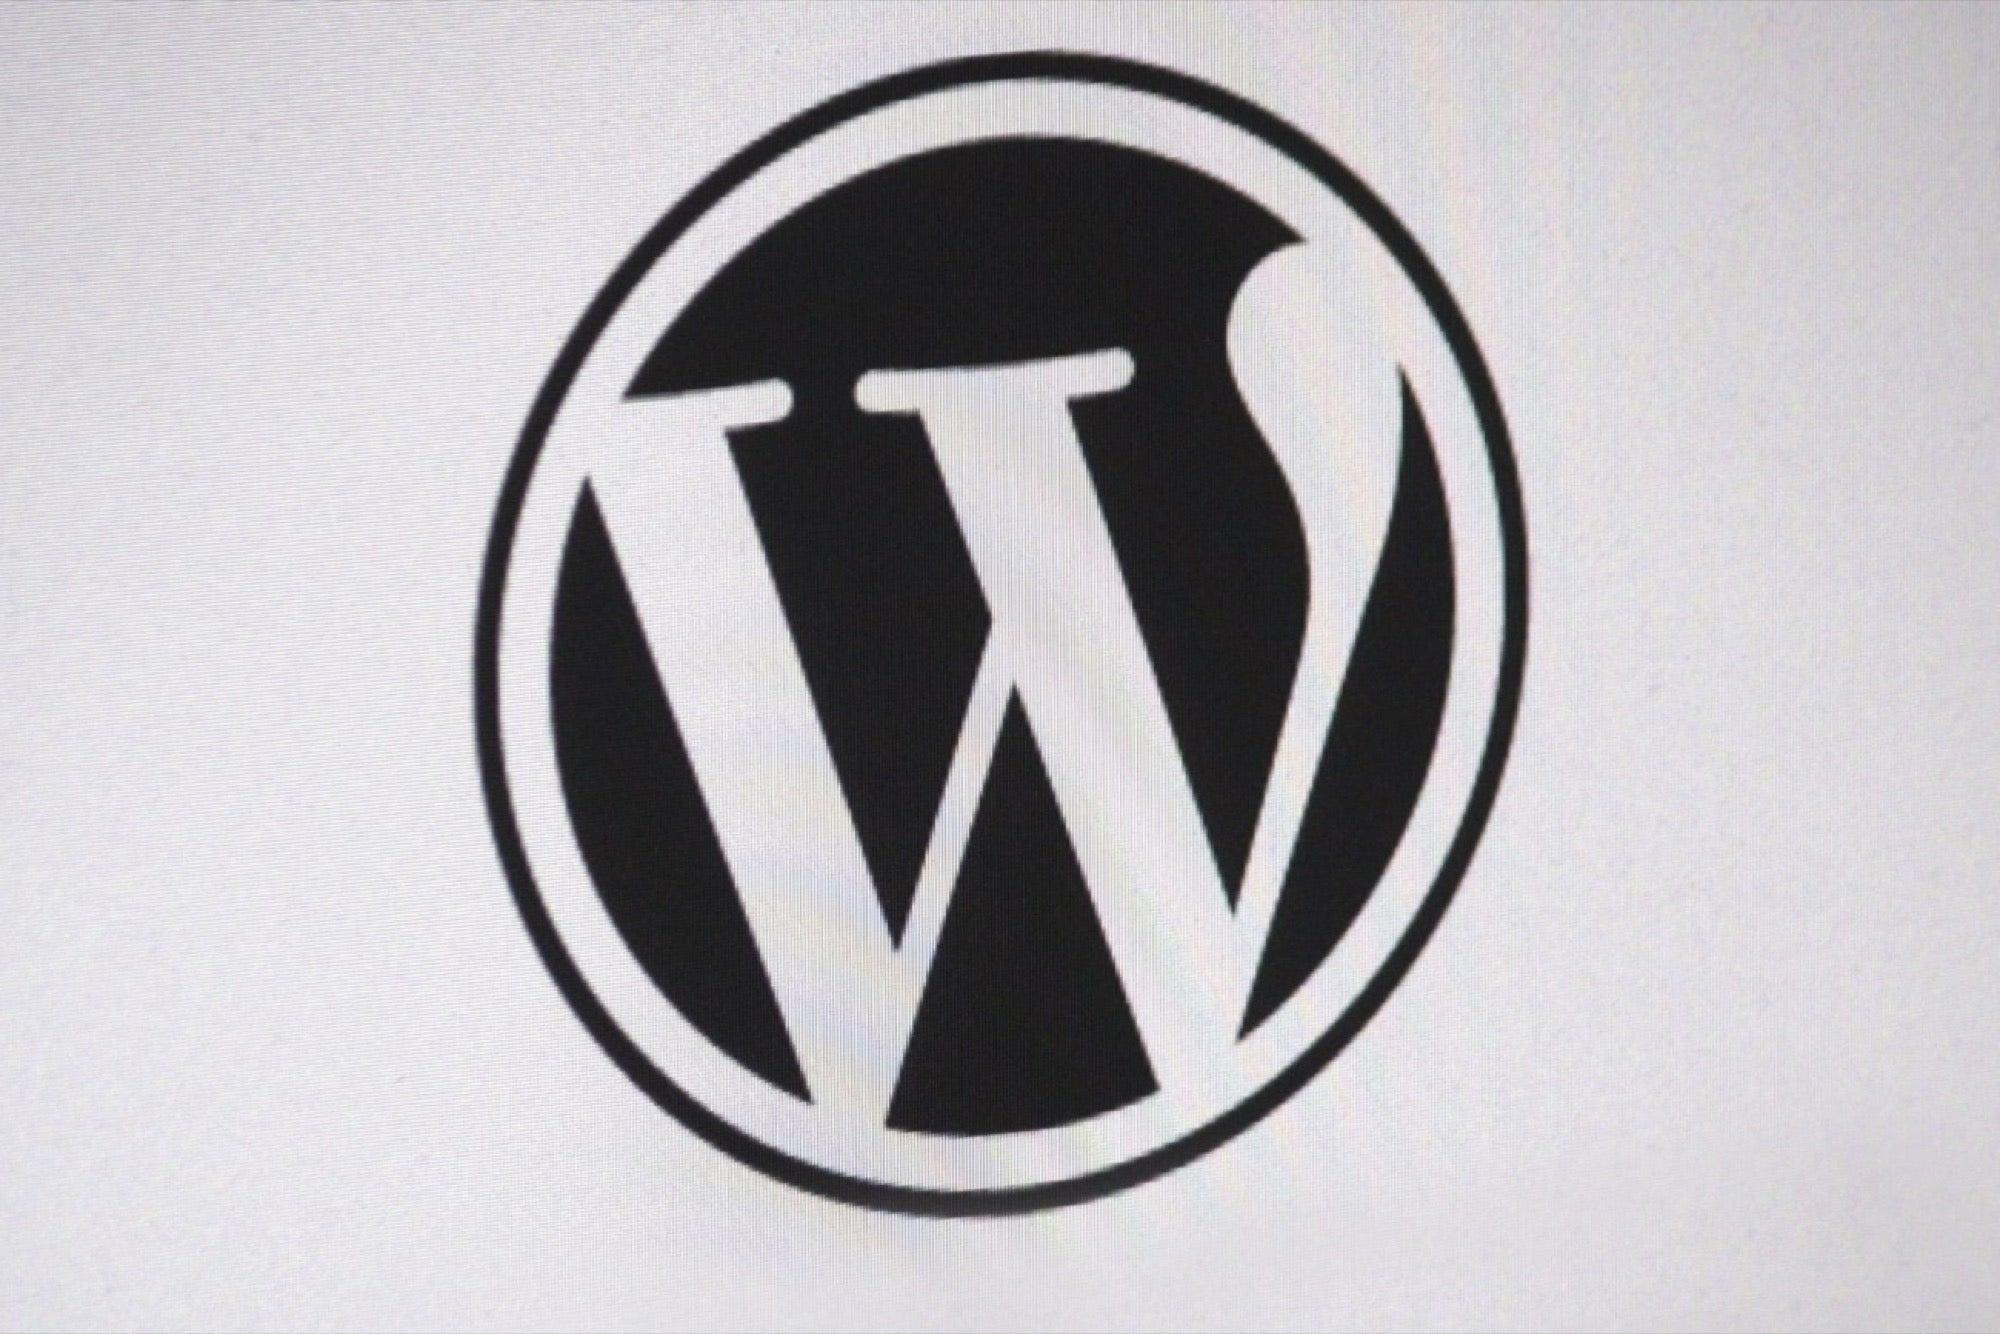 Top 10 WordPress Themes for Entrepreneurs Top 10 WordPress Themes for Entrepreneurs - 웹